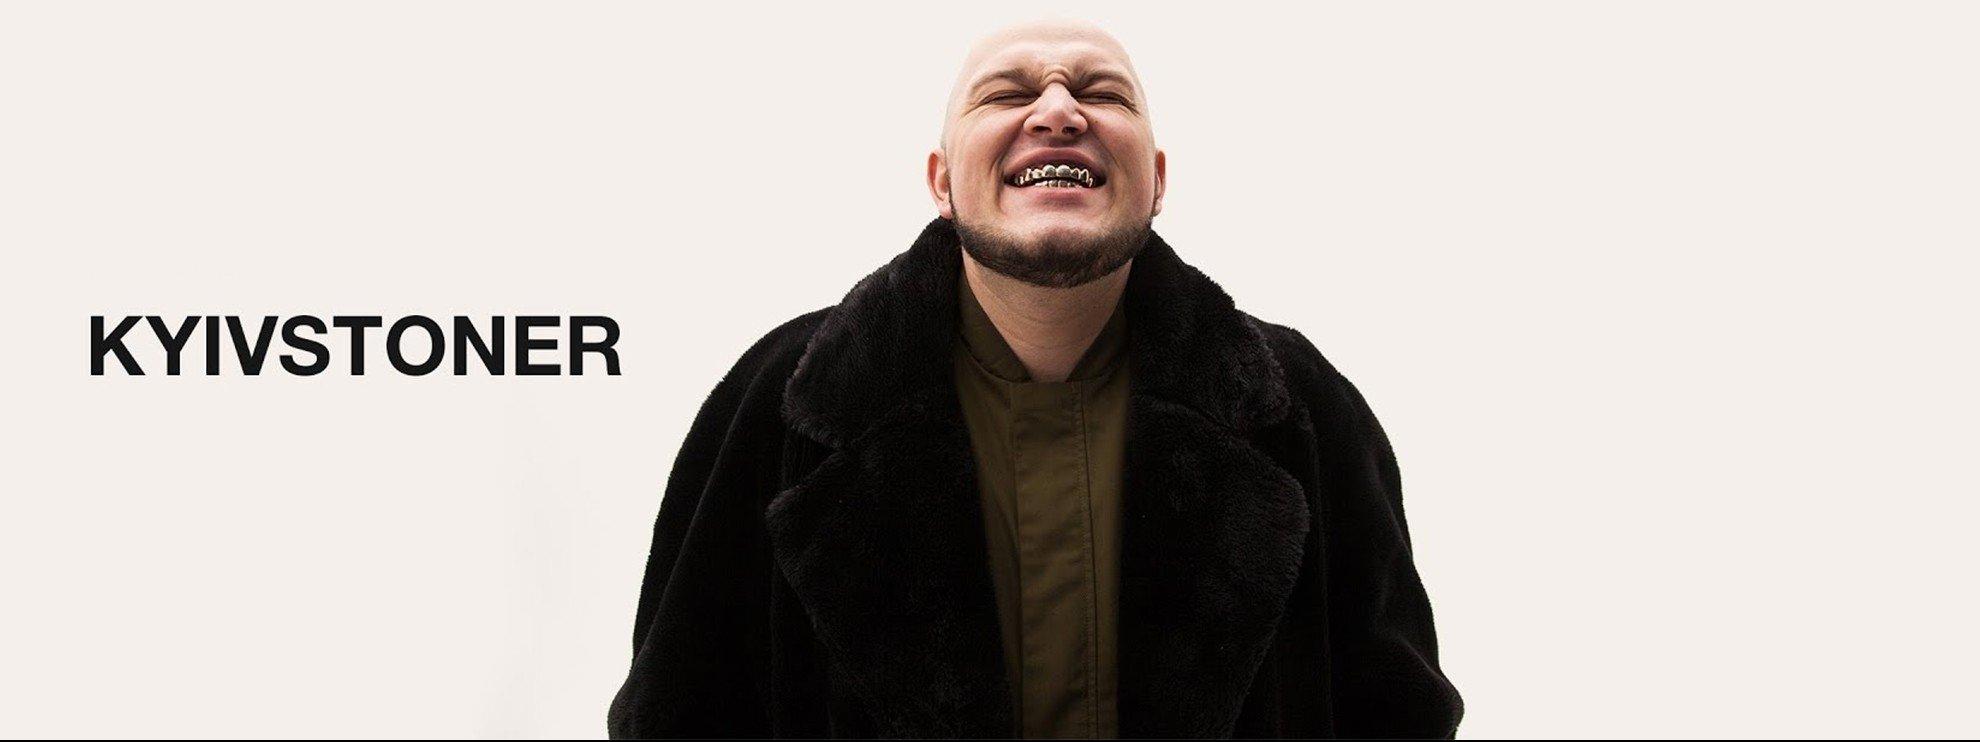 виконавець Kyivstoner